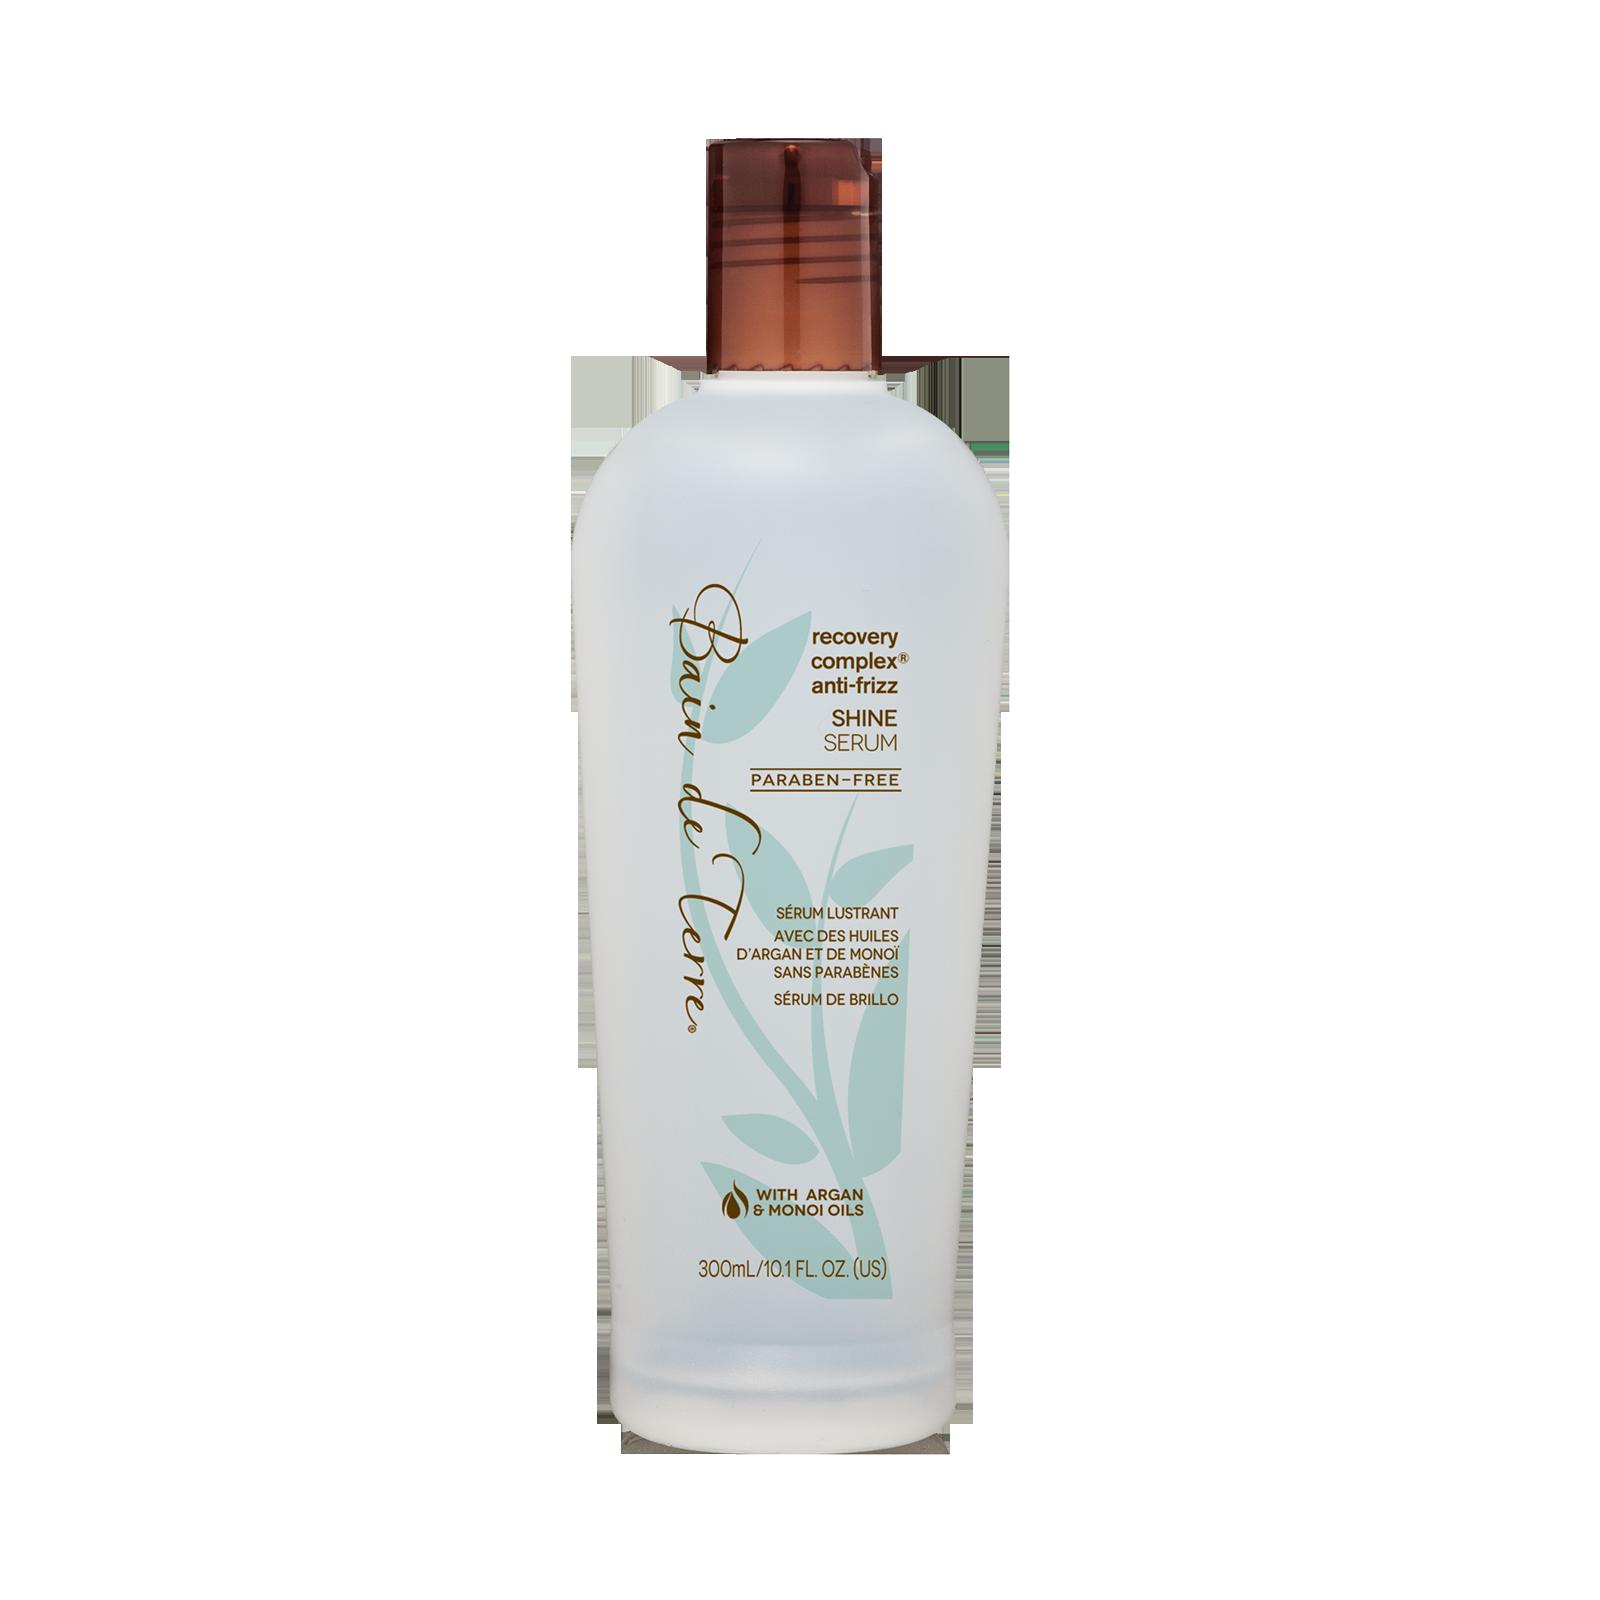 Buy Bain de Terre Anti Frizz Shine Serum 10.1 fl oz at